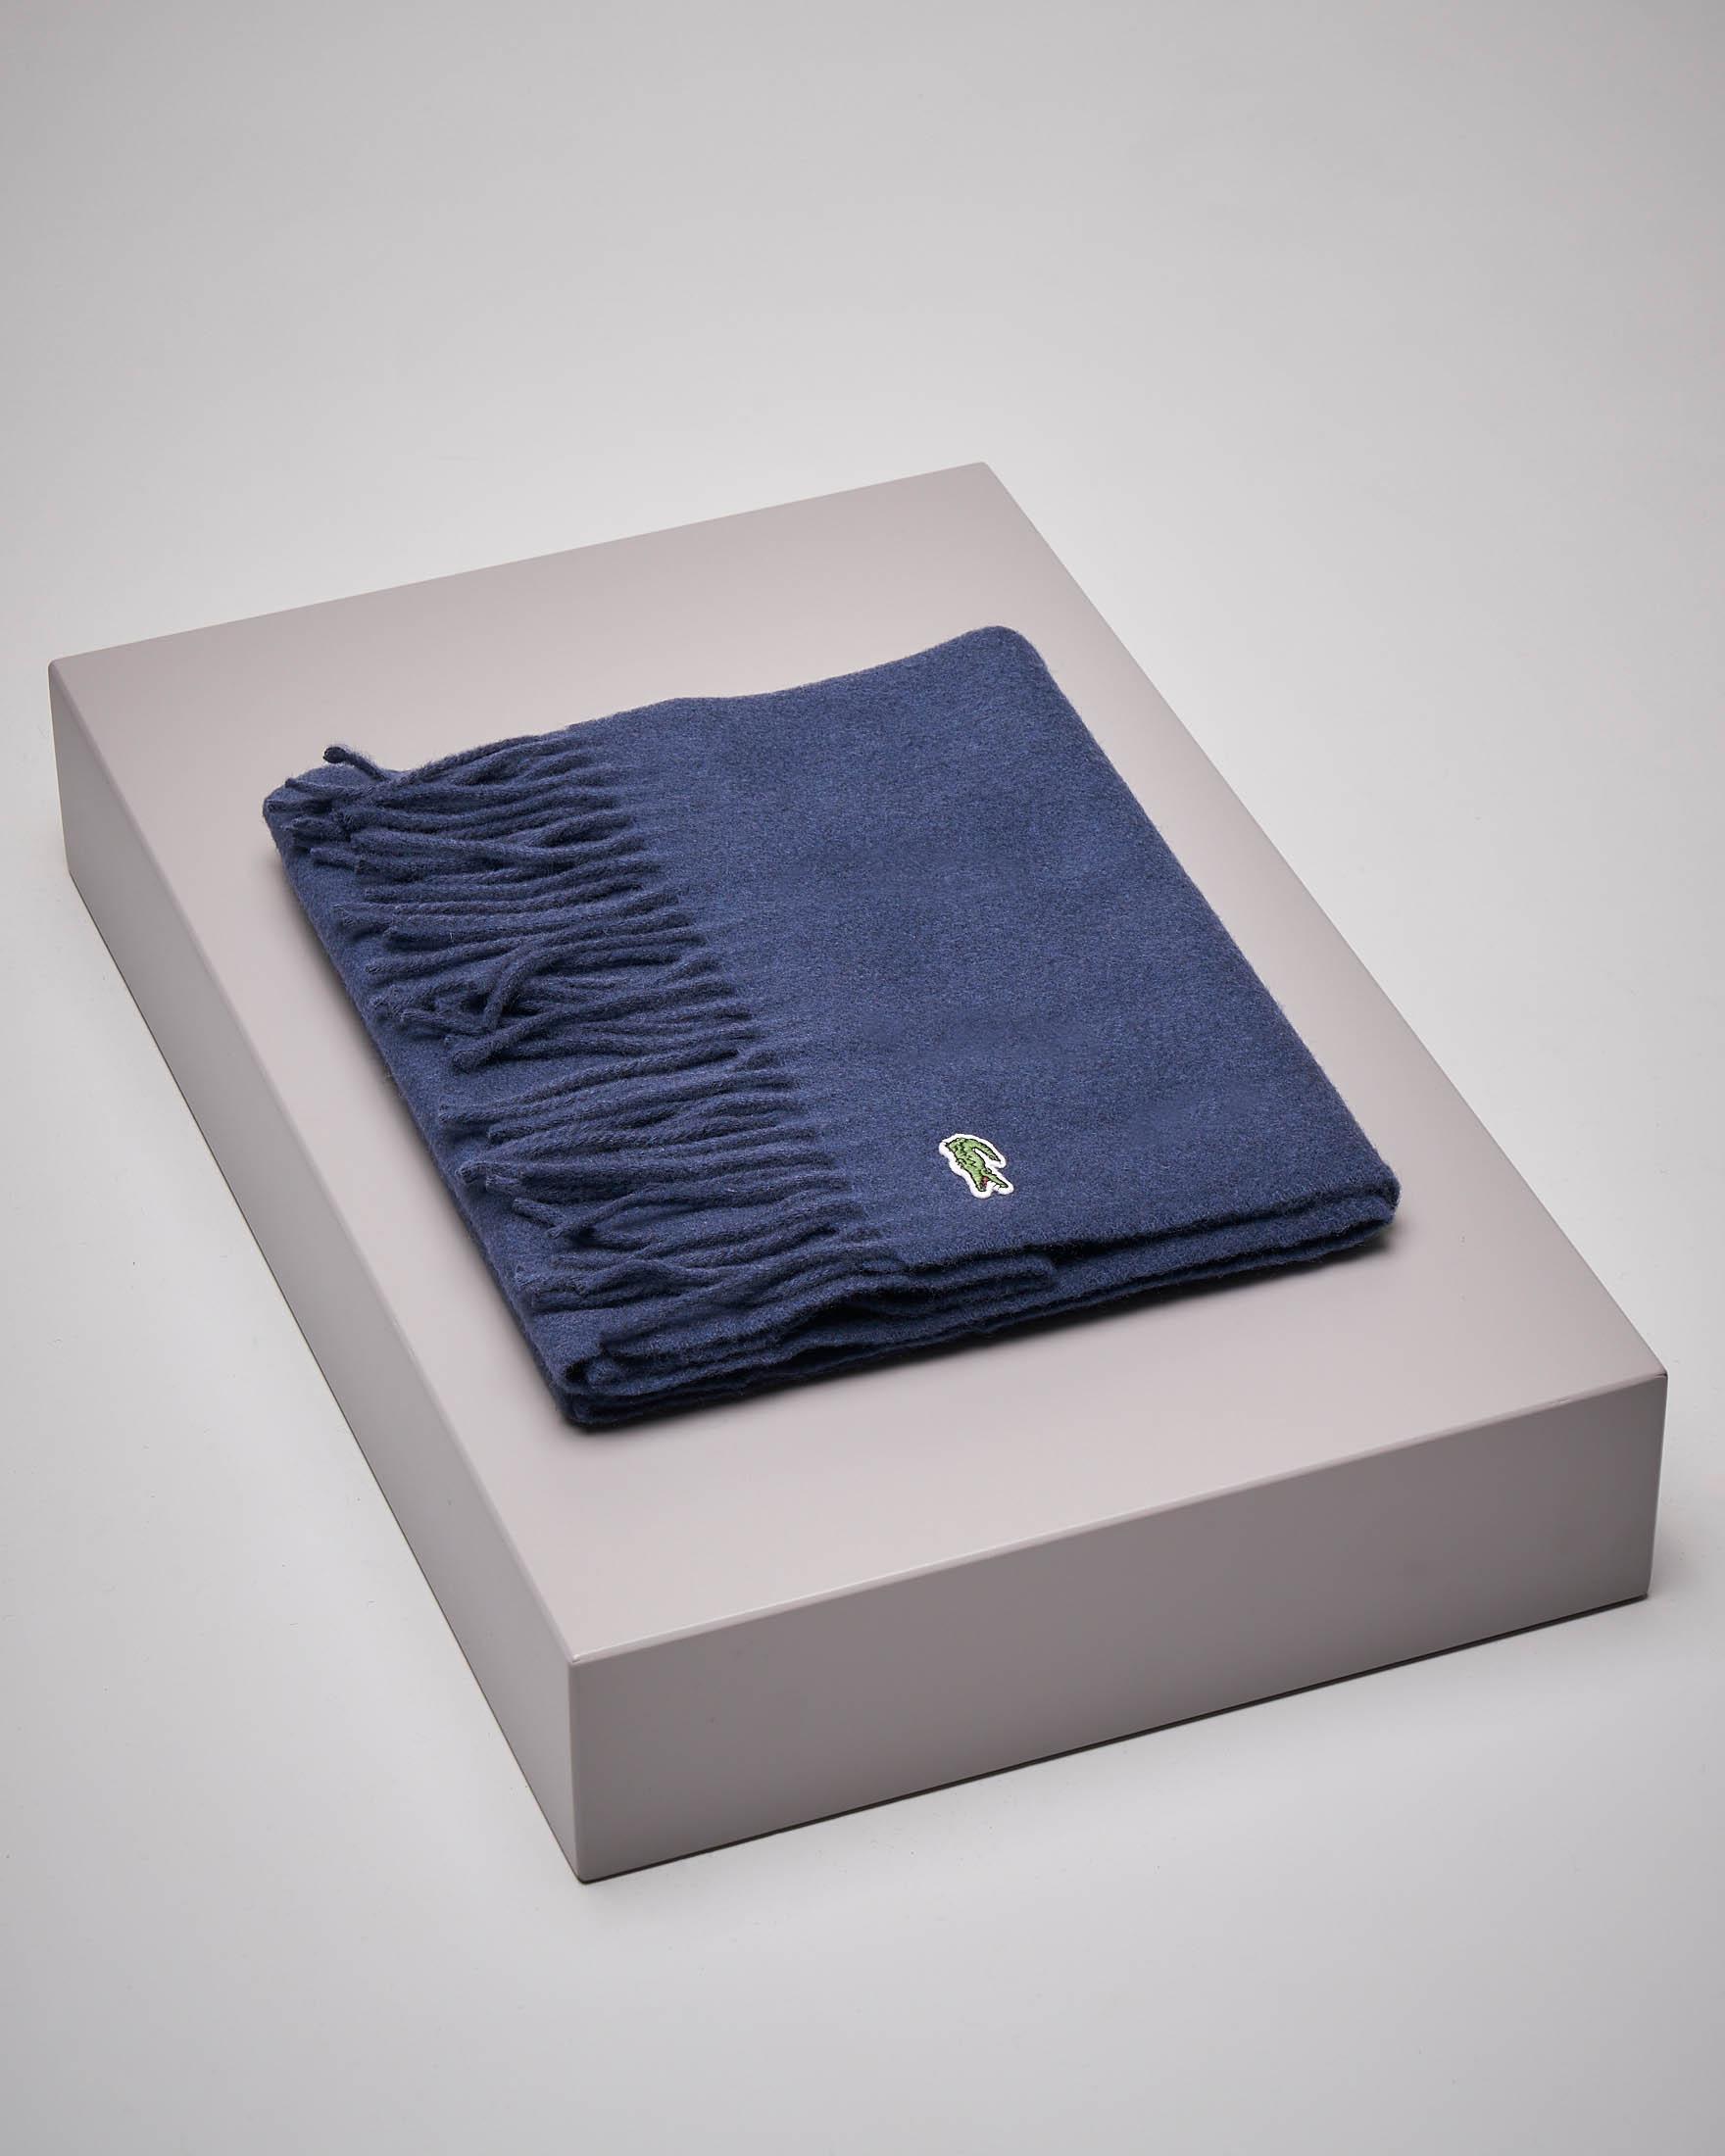 Sciarpa blu in lana e cachemire